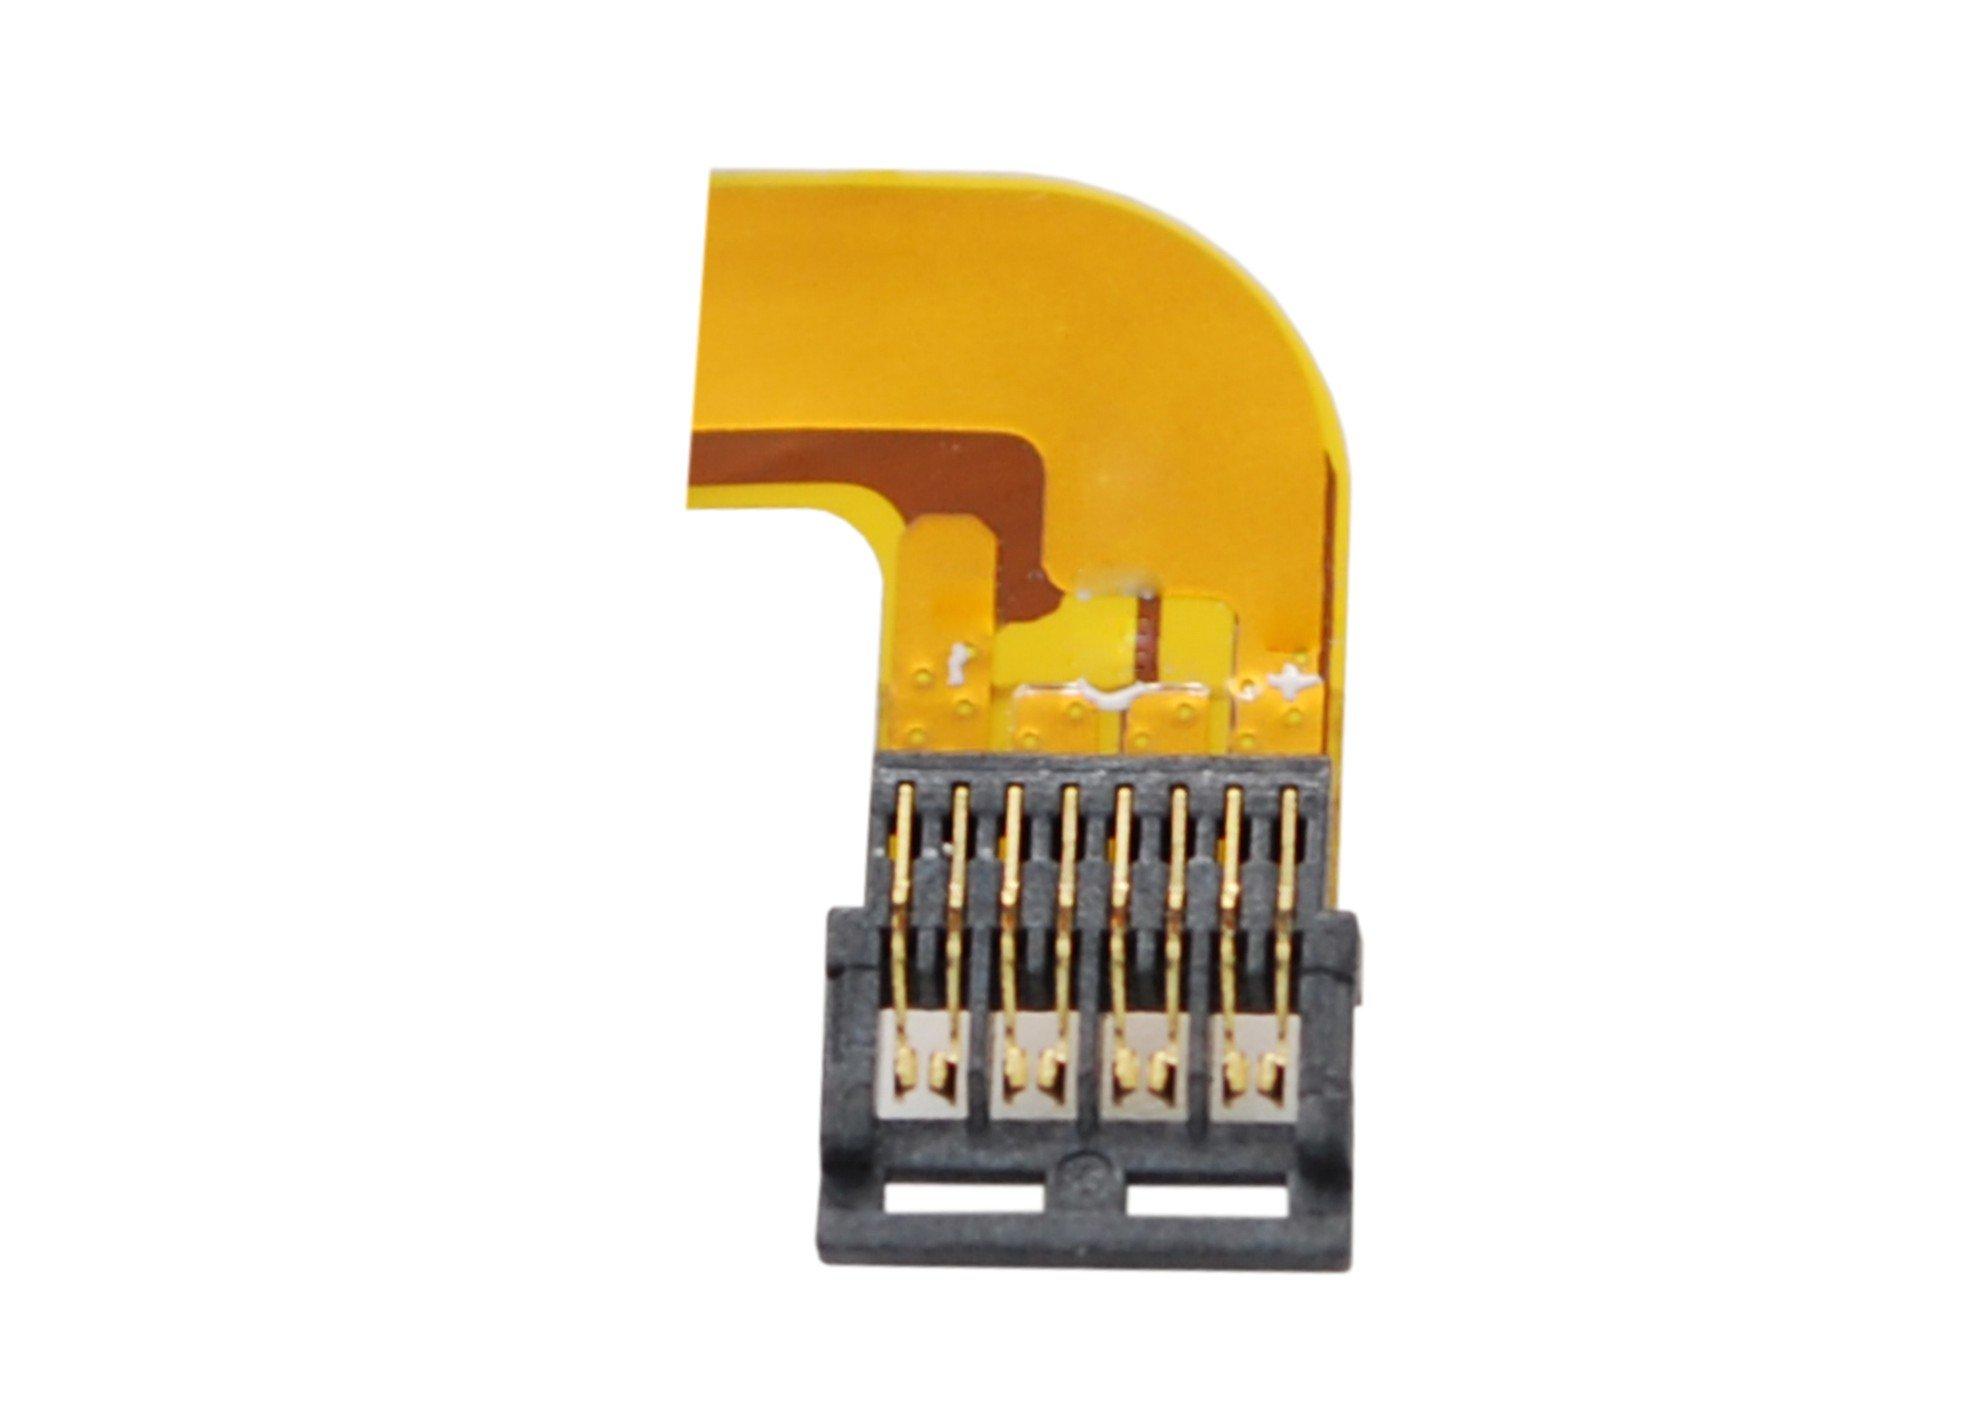 Cameron Sino 3200mAh Li-Polymer Replacement Battery for Google Nexus 6, Motorola Shamu, XT1100, XT1103, XT1115, fits Motorola EZ30, SNN5953A with tools kit